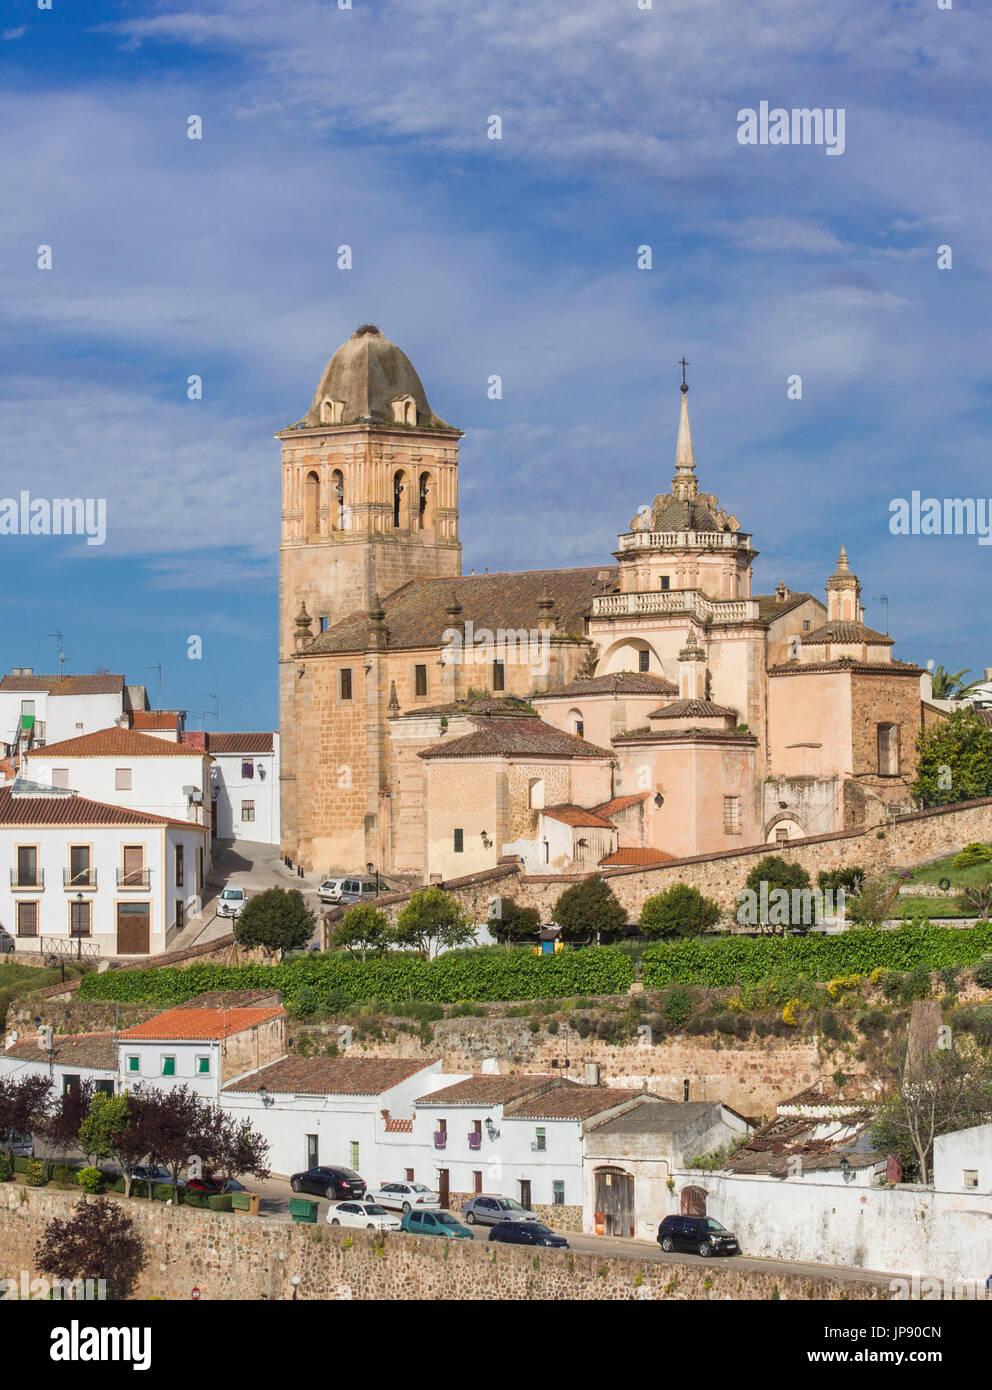 Spagna, regione dell'Extremadura, Jerez de los Caballeros Città, Encarnacion Chiesa Foto Stock